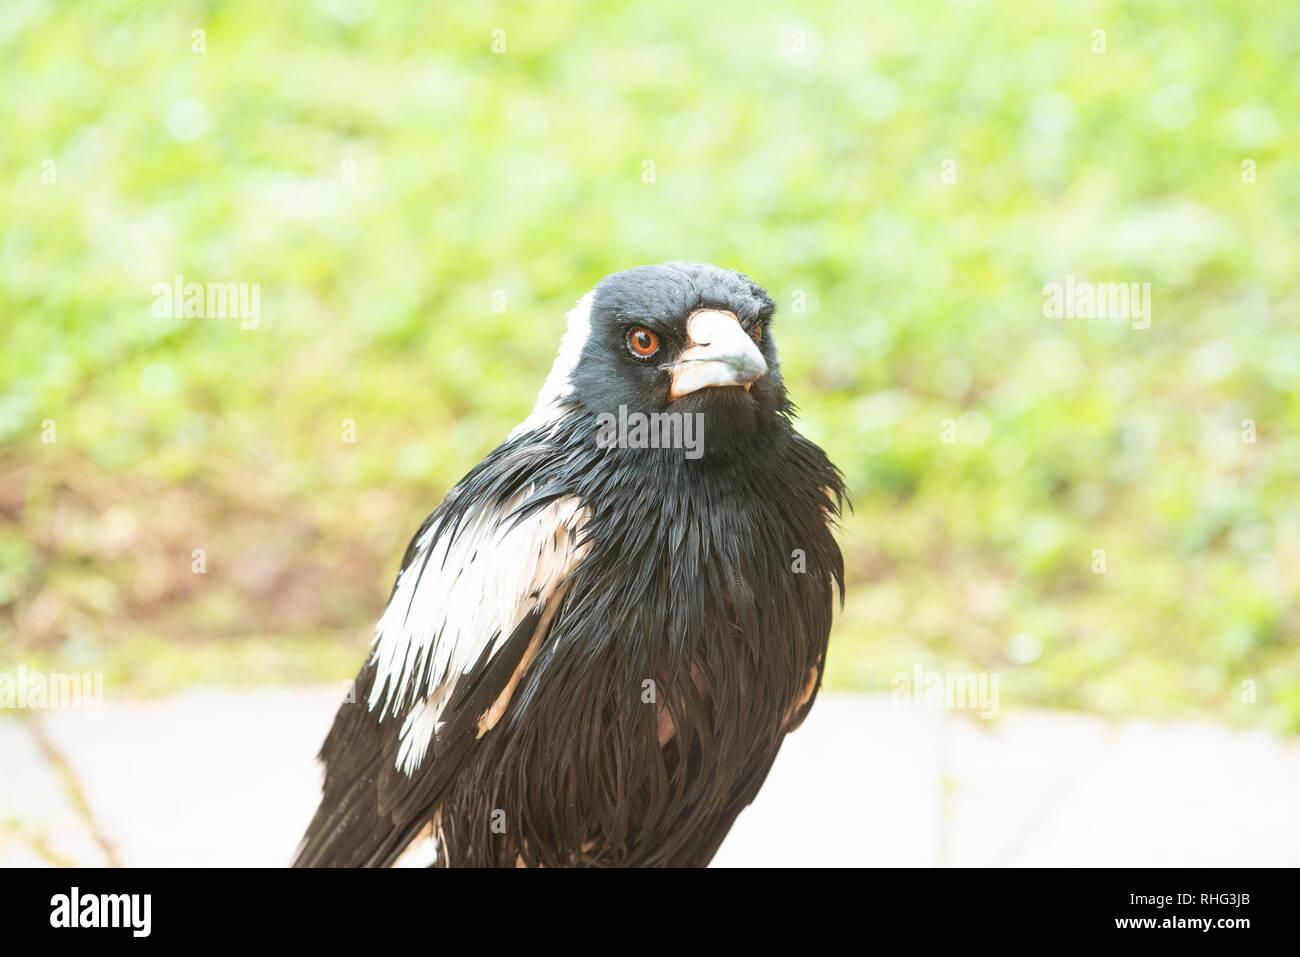 Australian Magpie wet after rain, Wollongbar, New South Wales, Australia - Stock Image